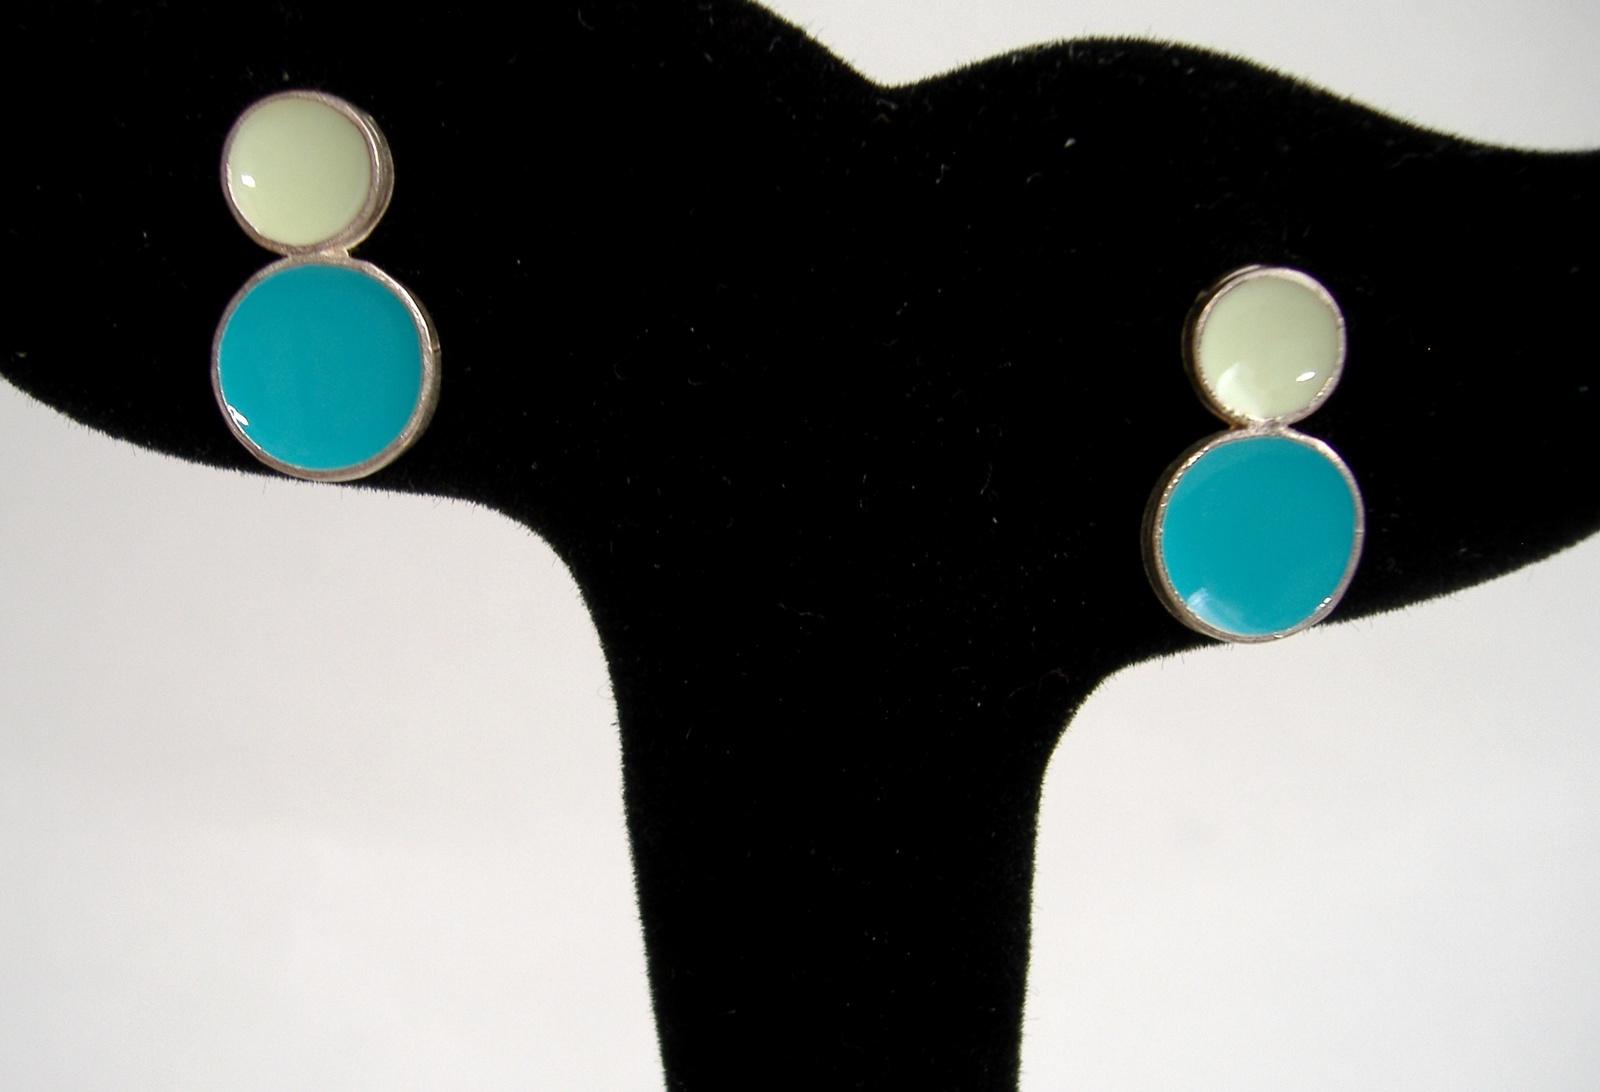 Turquoise Blue Aqua Mint Dot Enamel Earrings Silver Unique Handmade Pierced Post